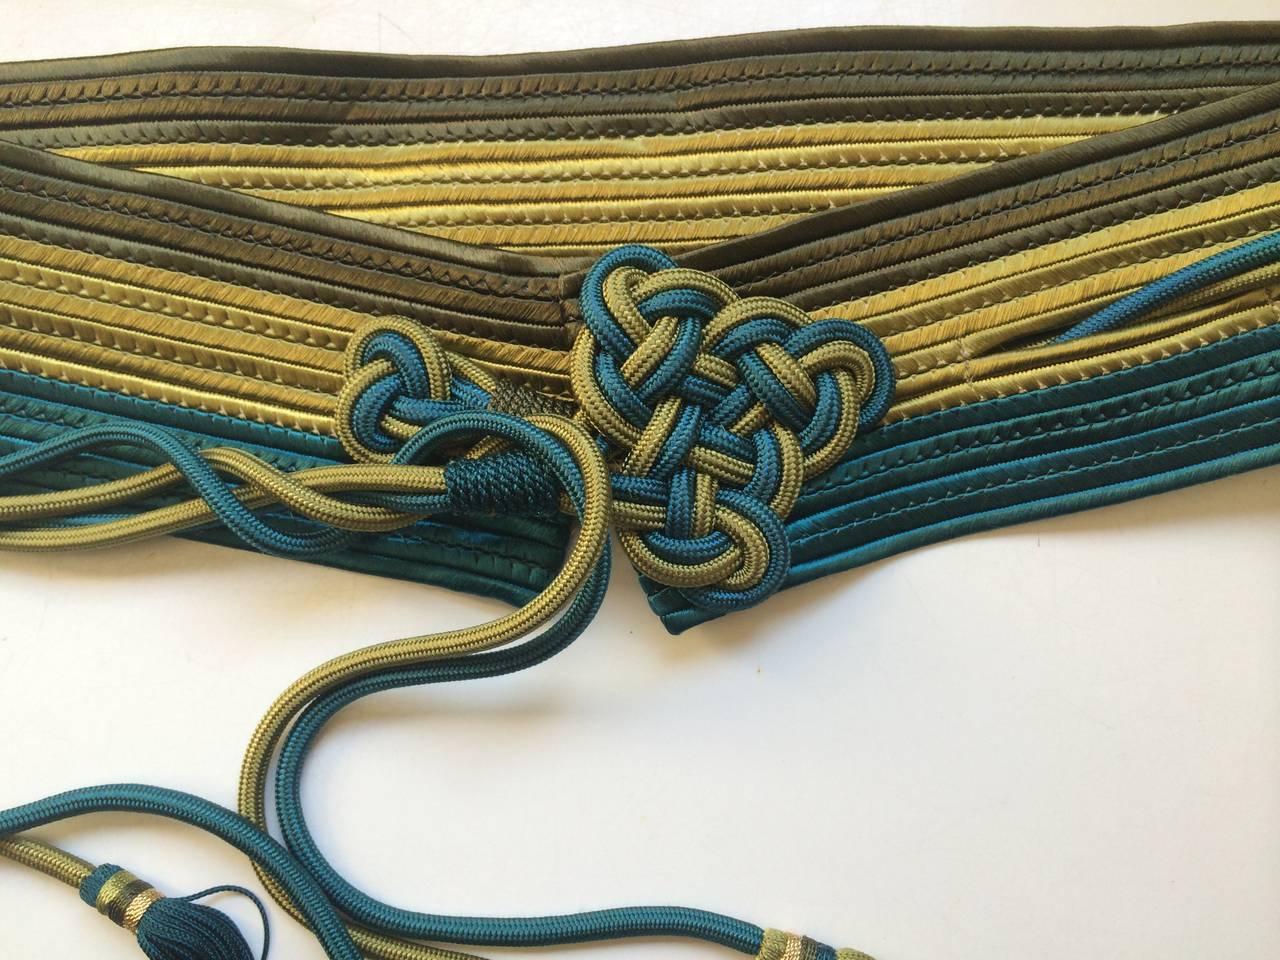 Vintage Yves Saint Laurent Russian Collection Passementerie Tassel Belt YSL 4